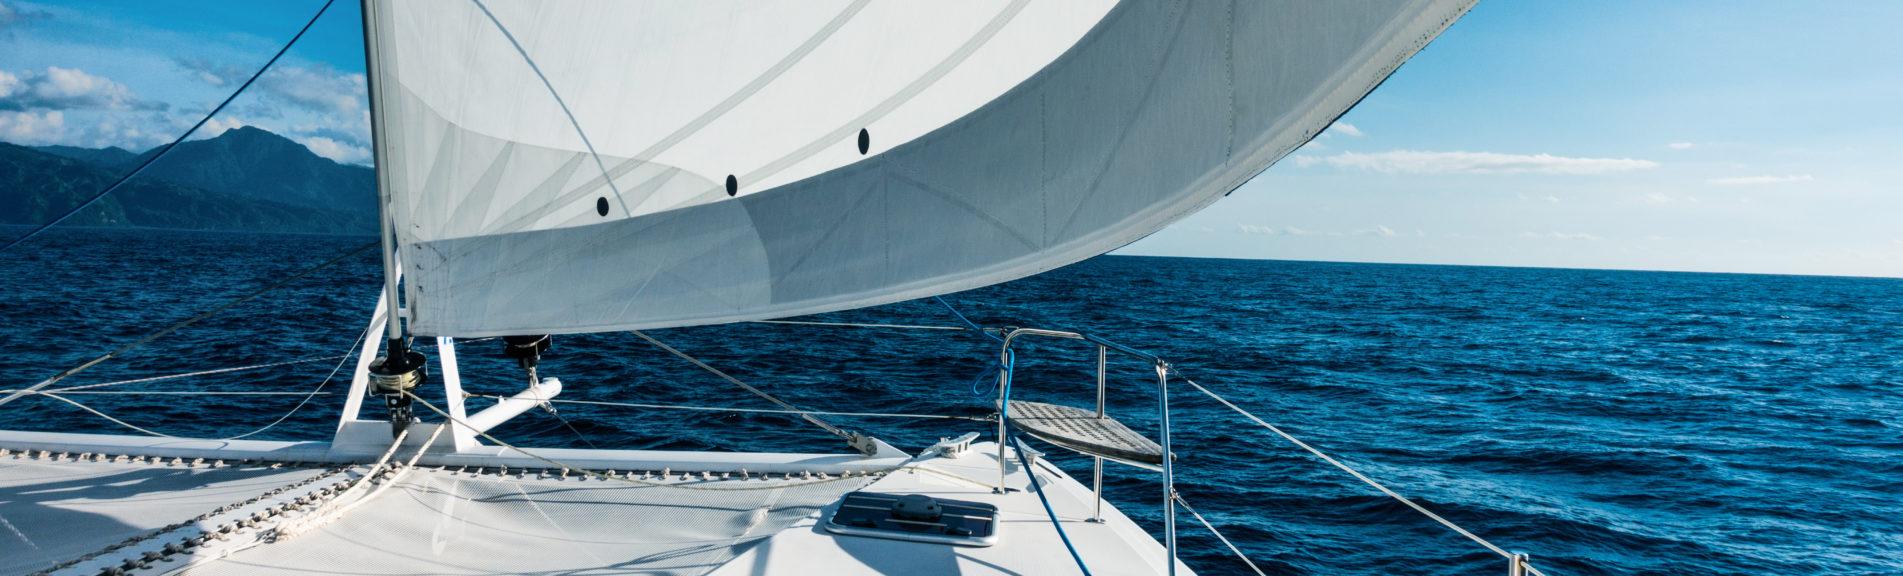 Sailing yacht catamaran sailing in the sea